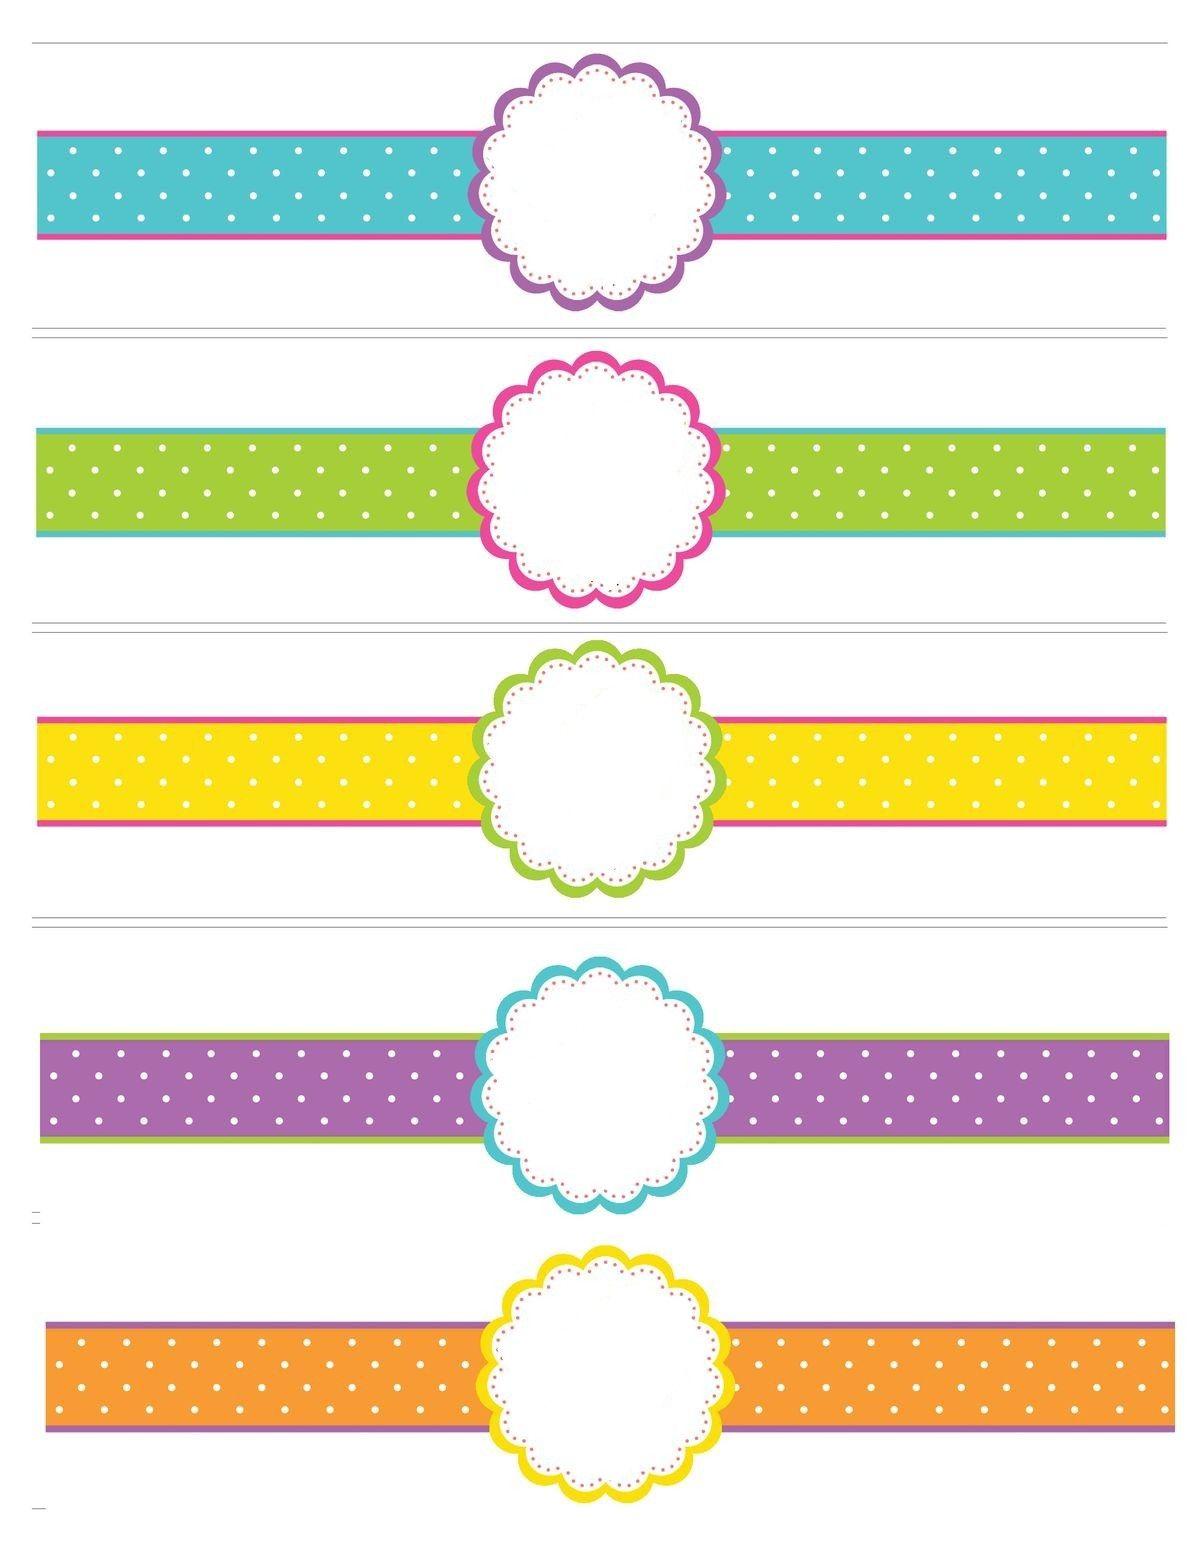 Pin By Randa Mosaad On ثيمات فارغة Sticker Template Easter Crafts Birthdays